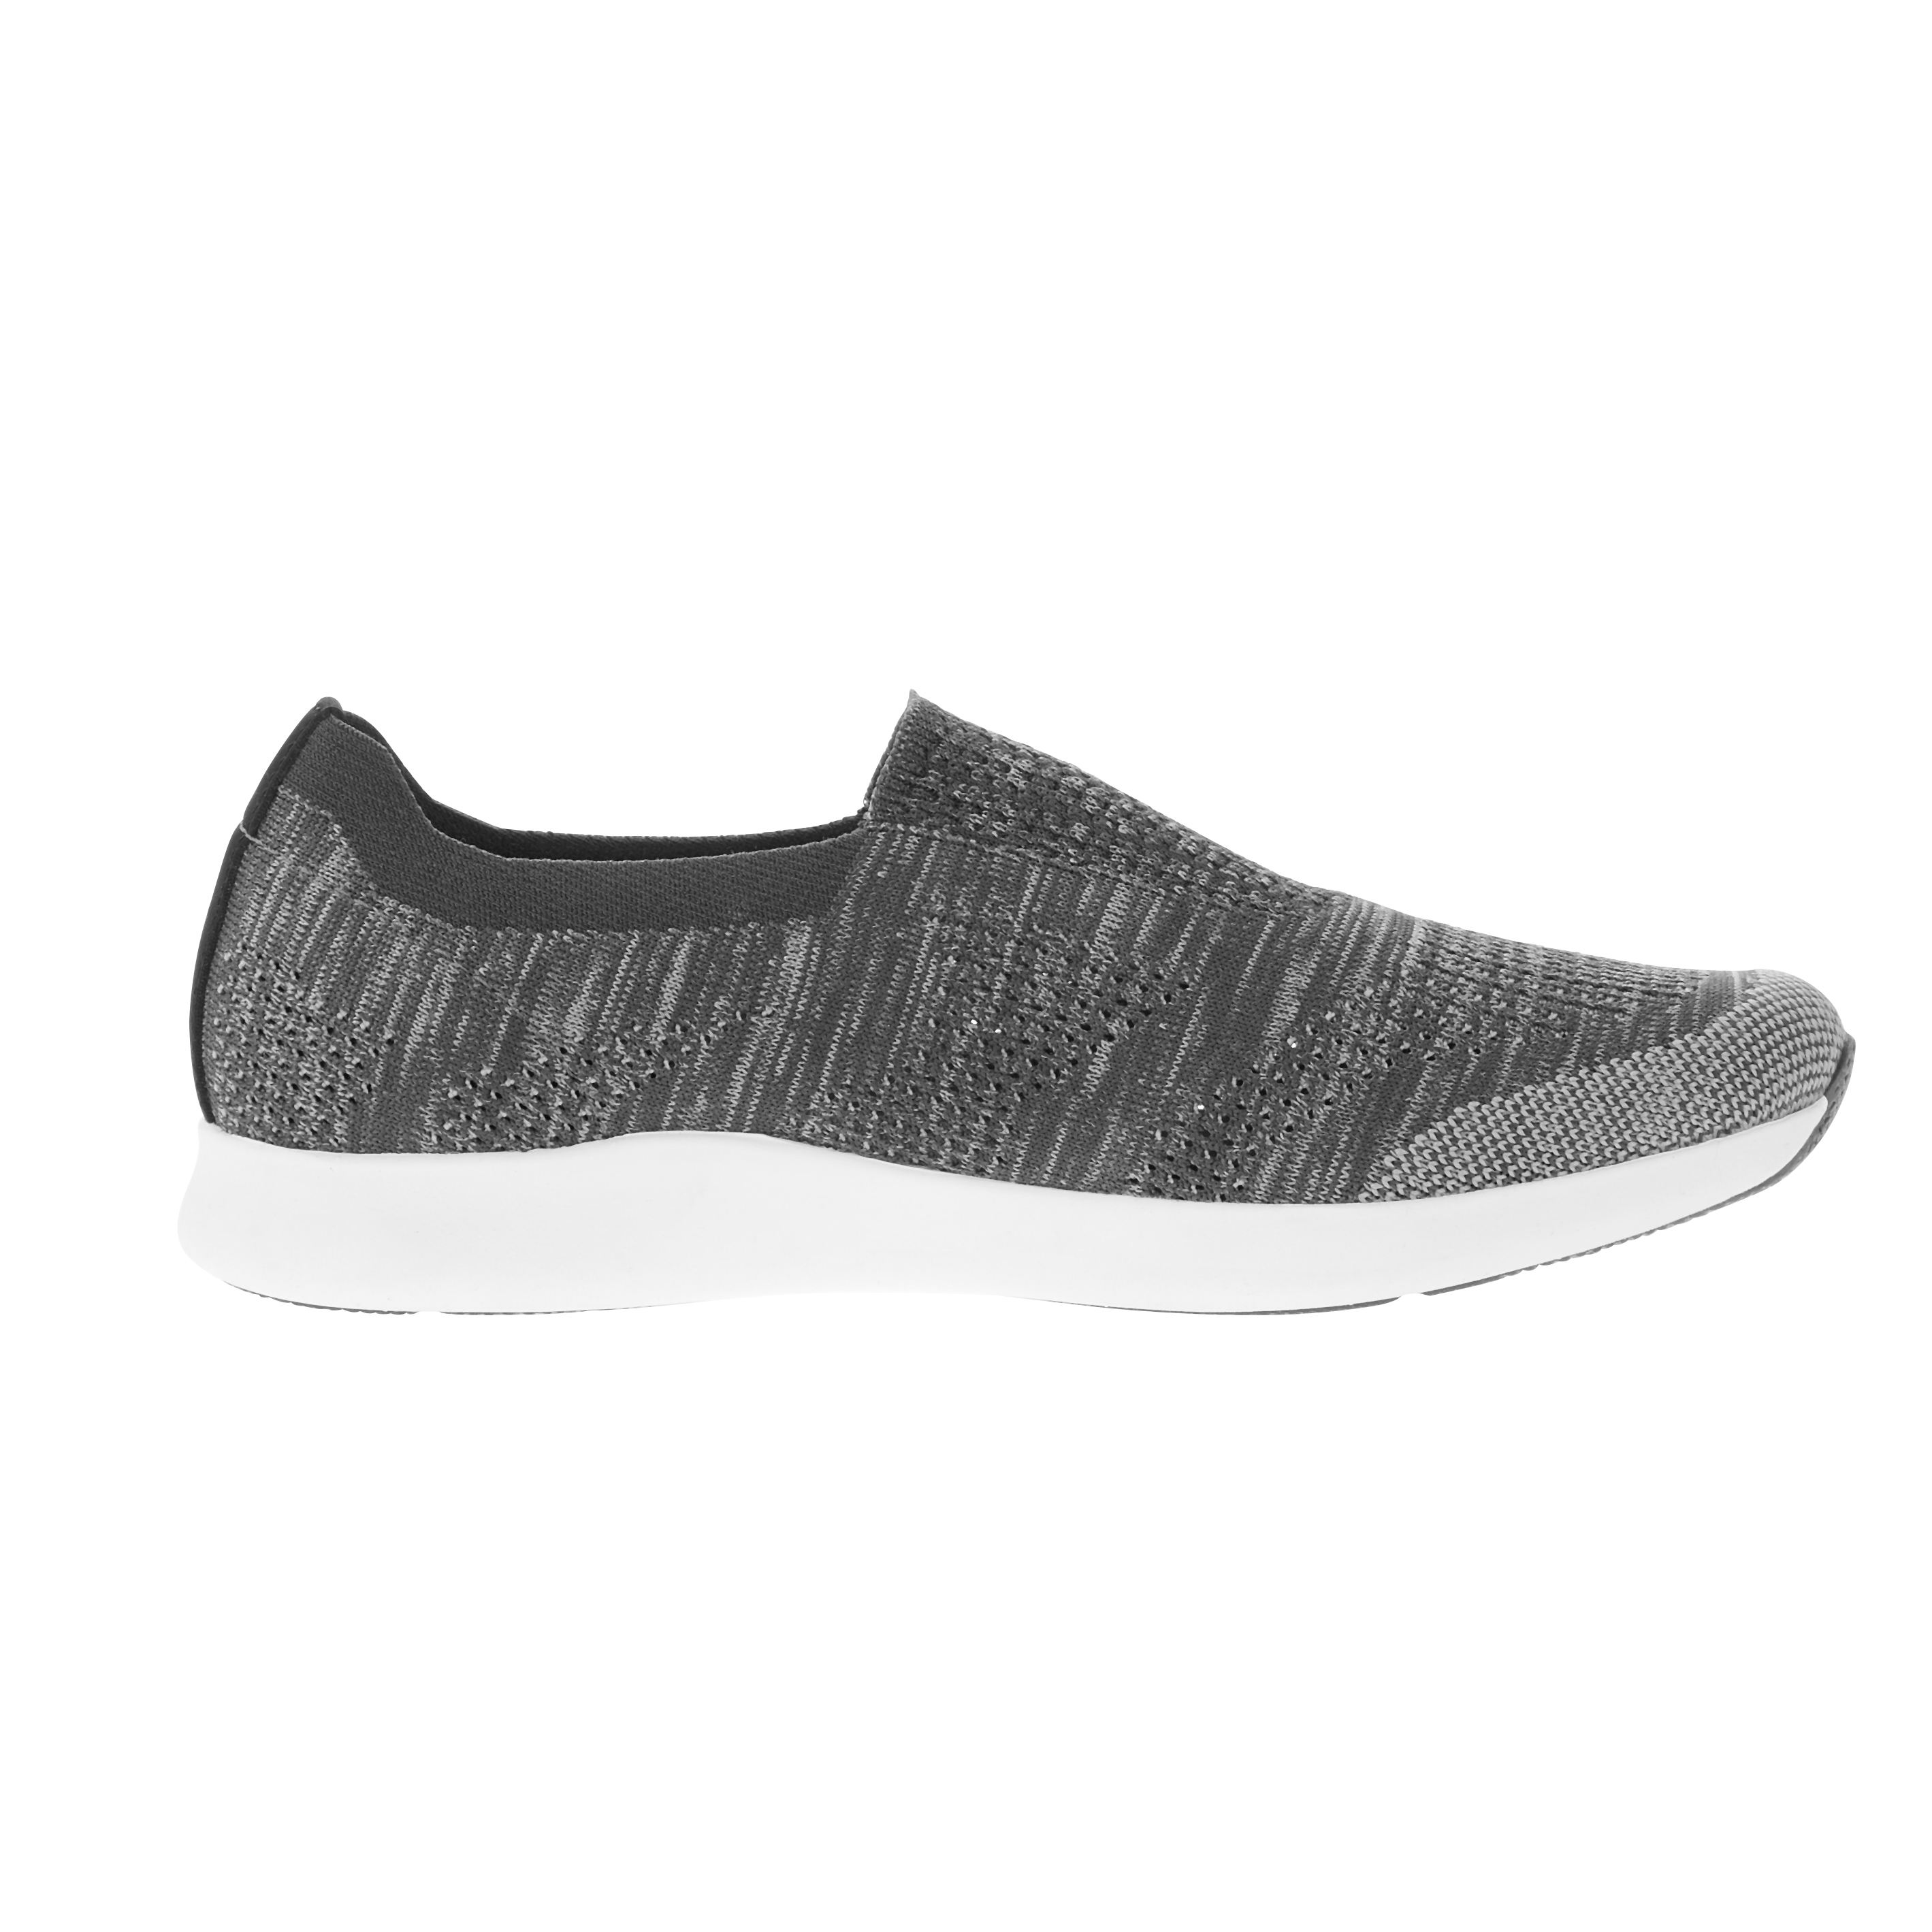 Mesh Slip-On Shoe - Walmart